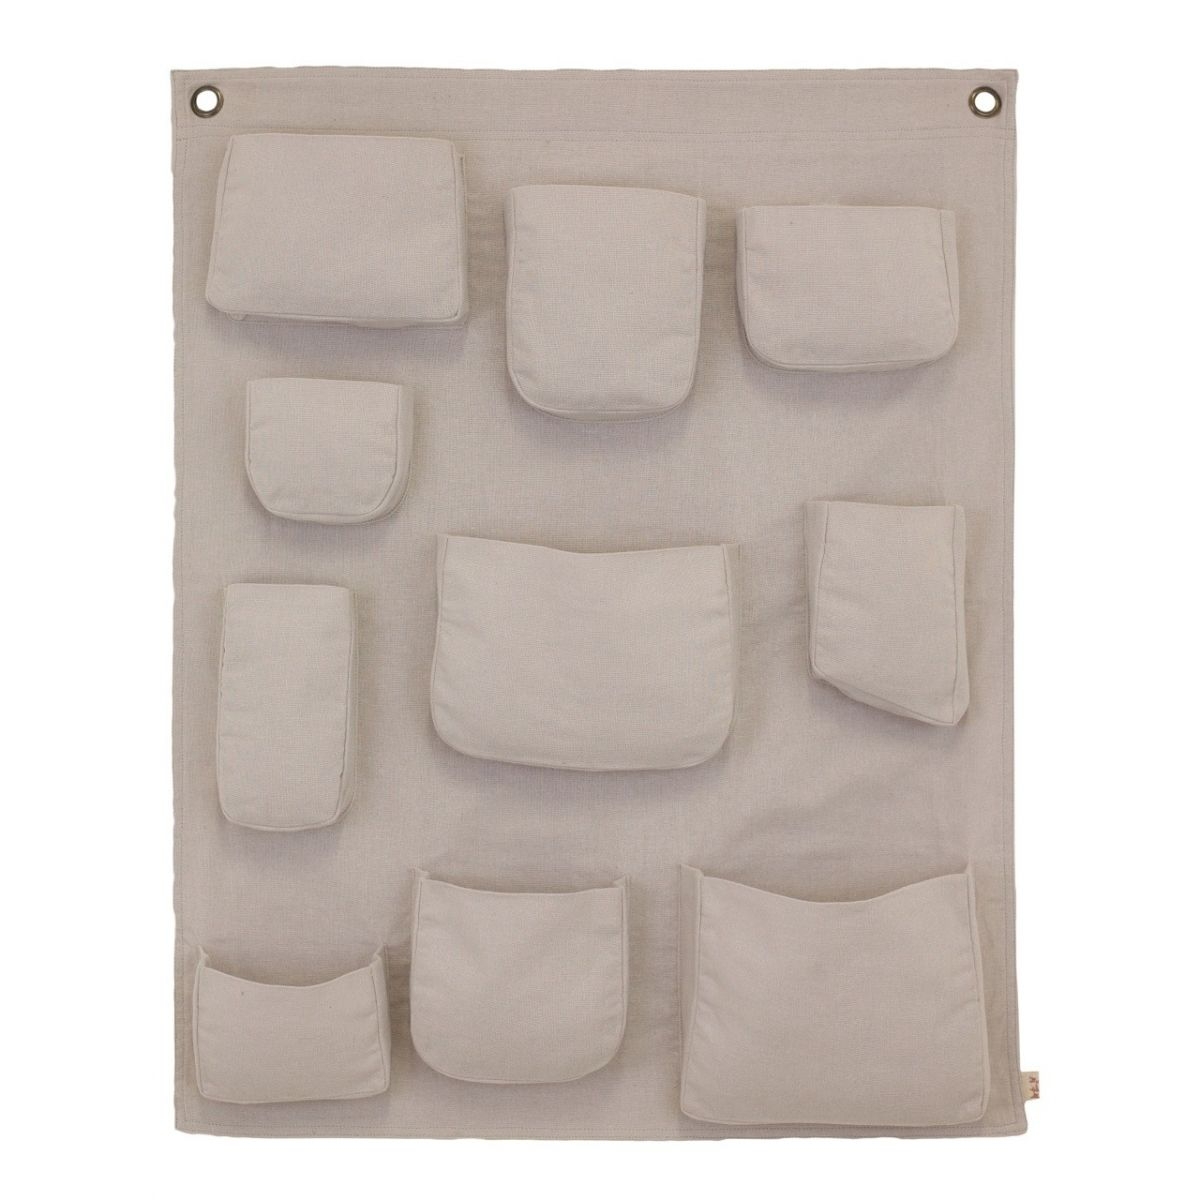 Organizer Wall Pocket pudrowy - Numero 74